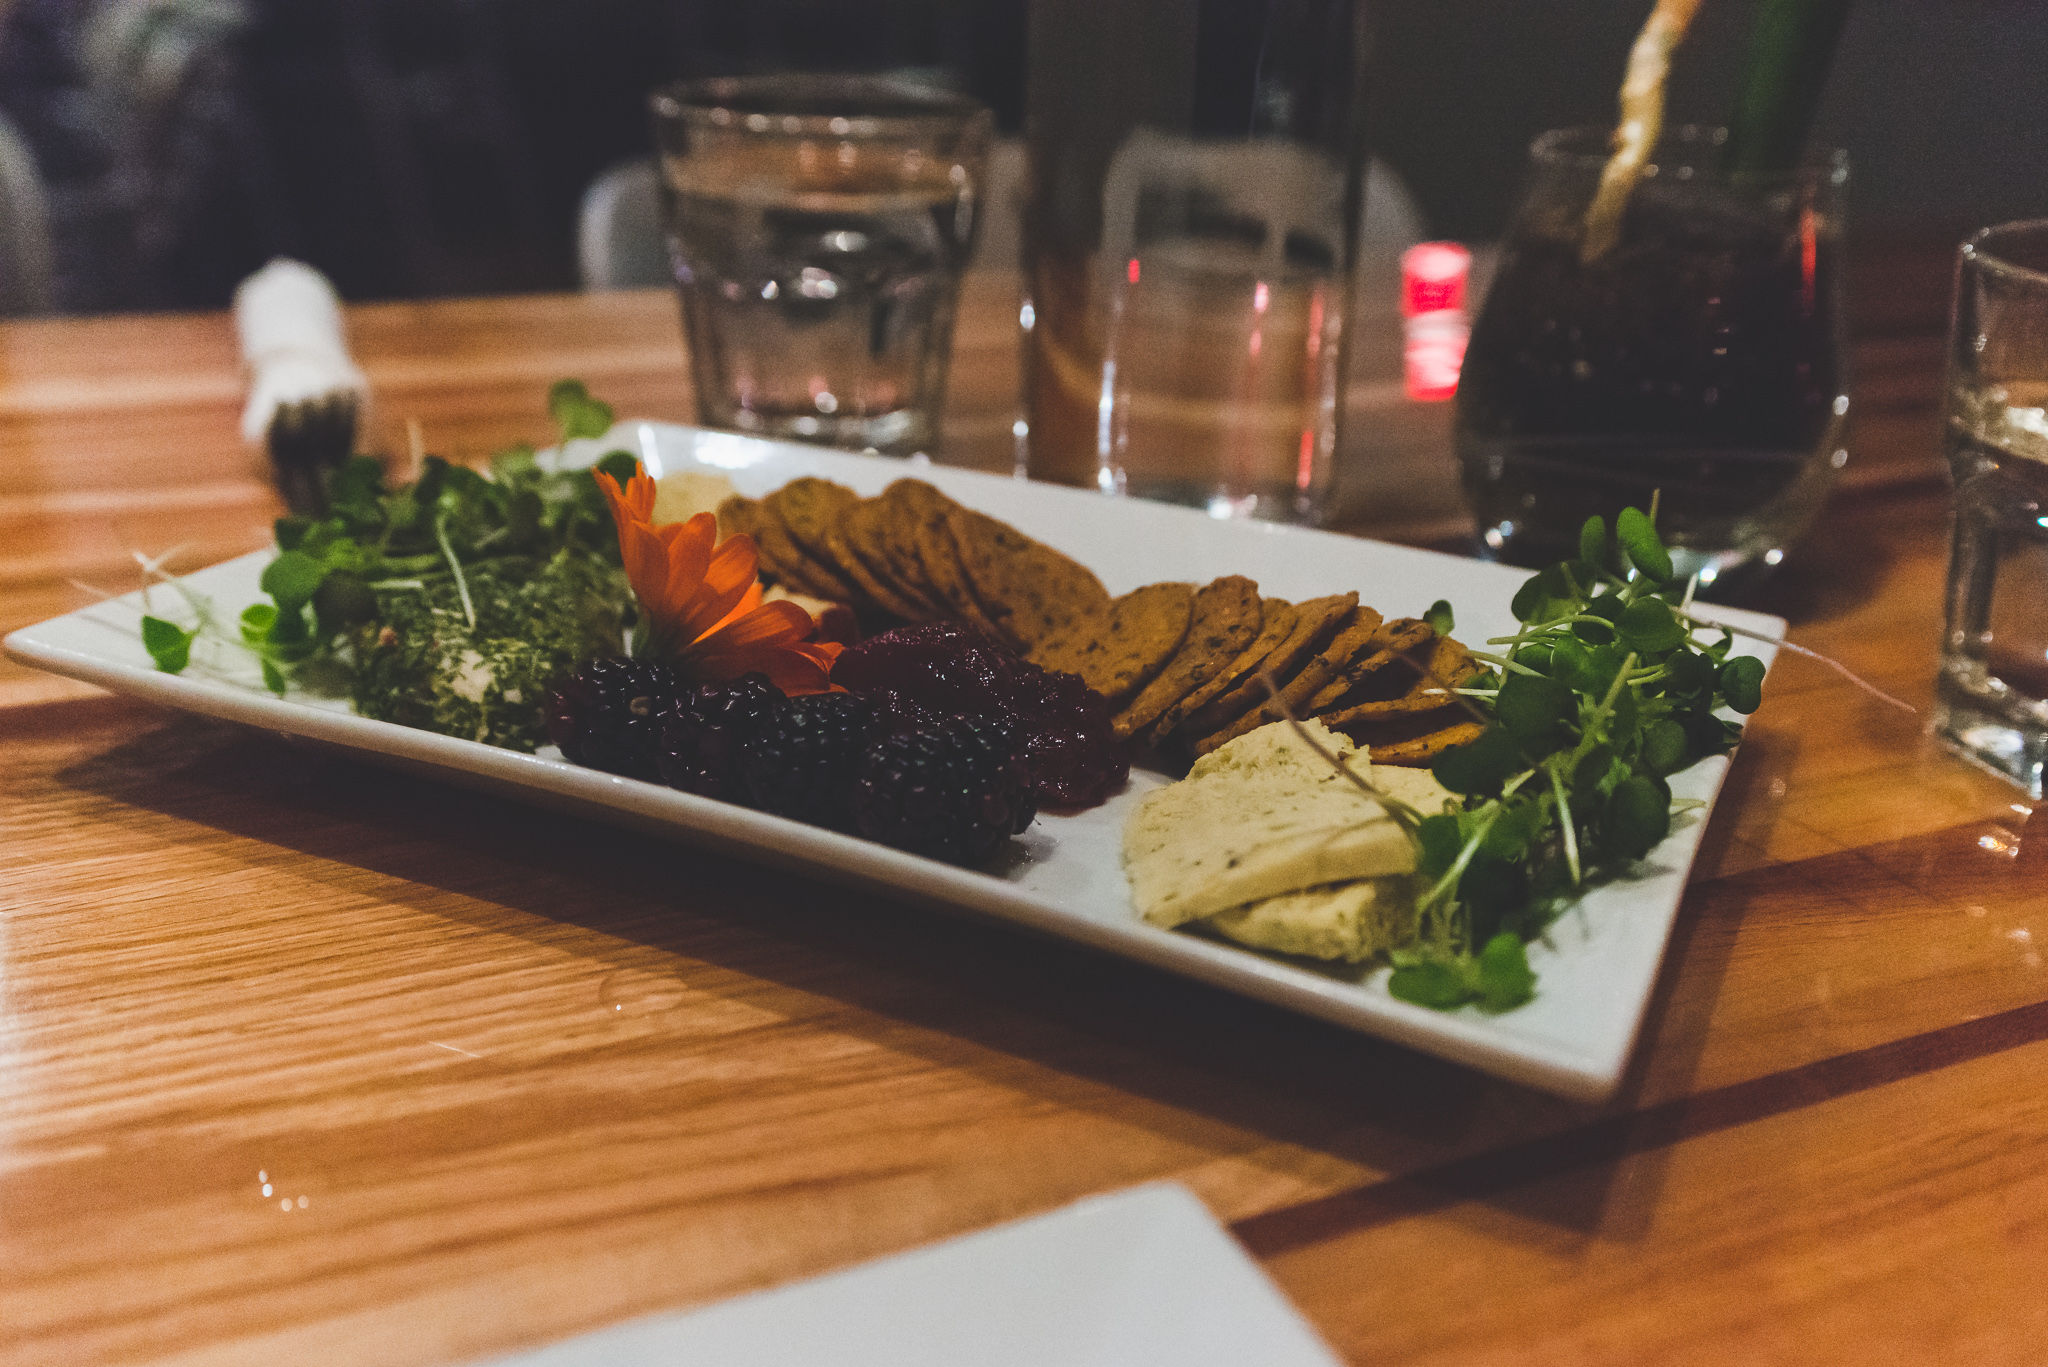 Vegan cheese plate / 4/28/16 / Zest / Salt Lake City, UT